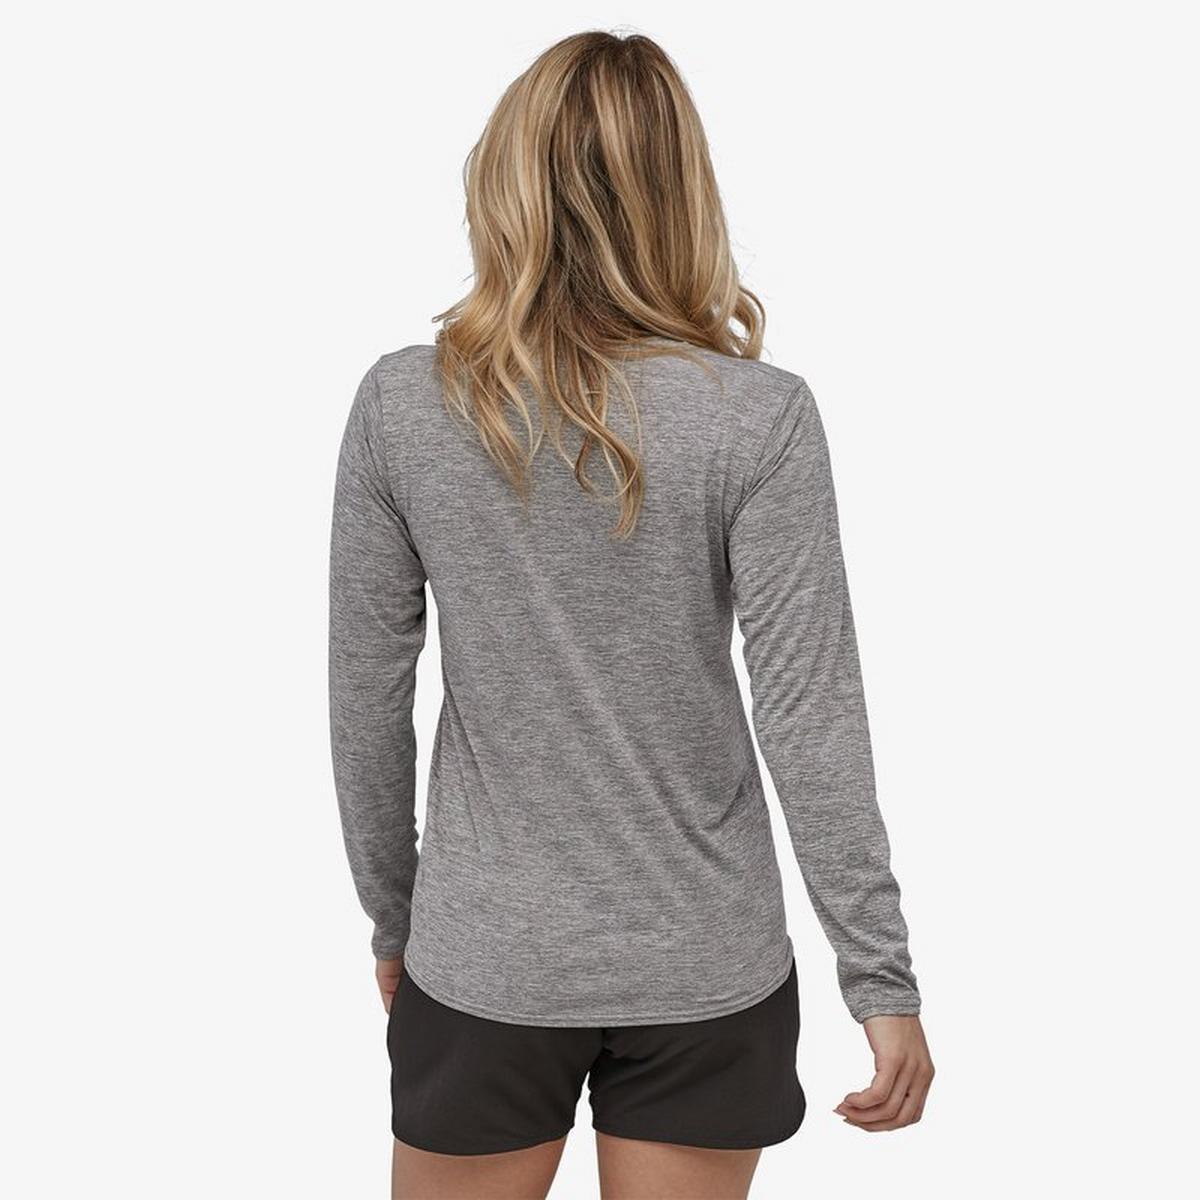 Patagonia Women's Patagonia Cap Cool Graphic LS T-shirt - Grey